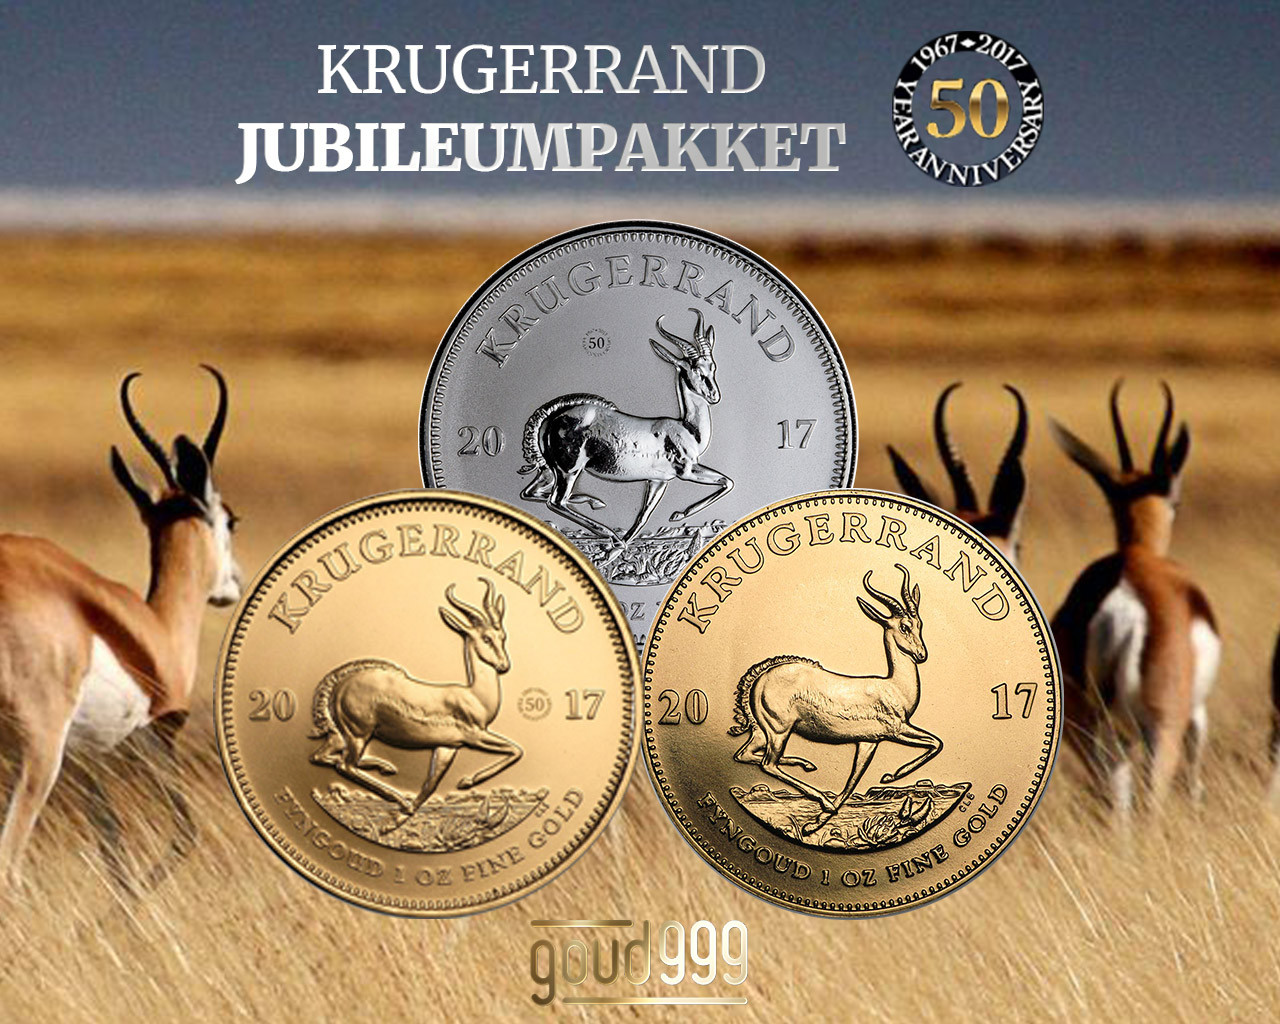 Krugerrand jubileumpakket   goud999